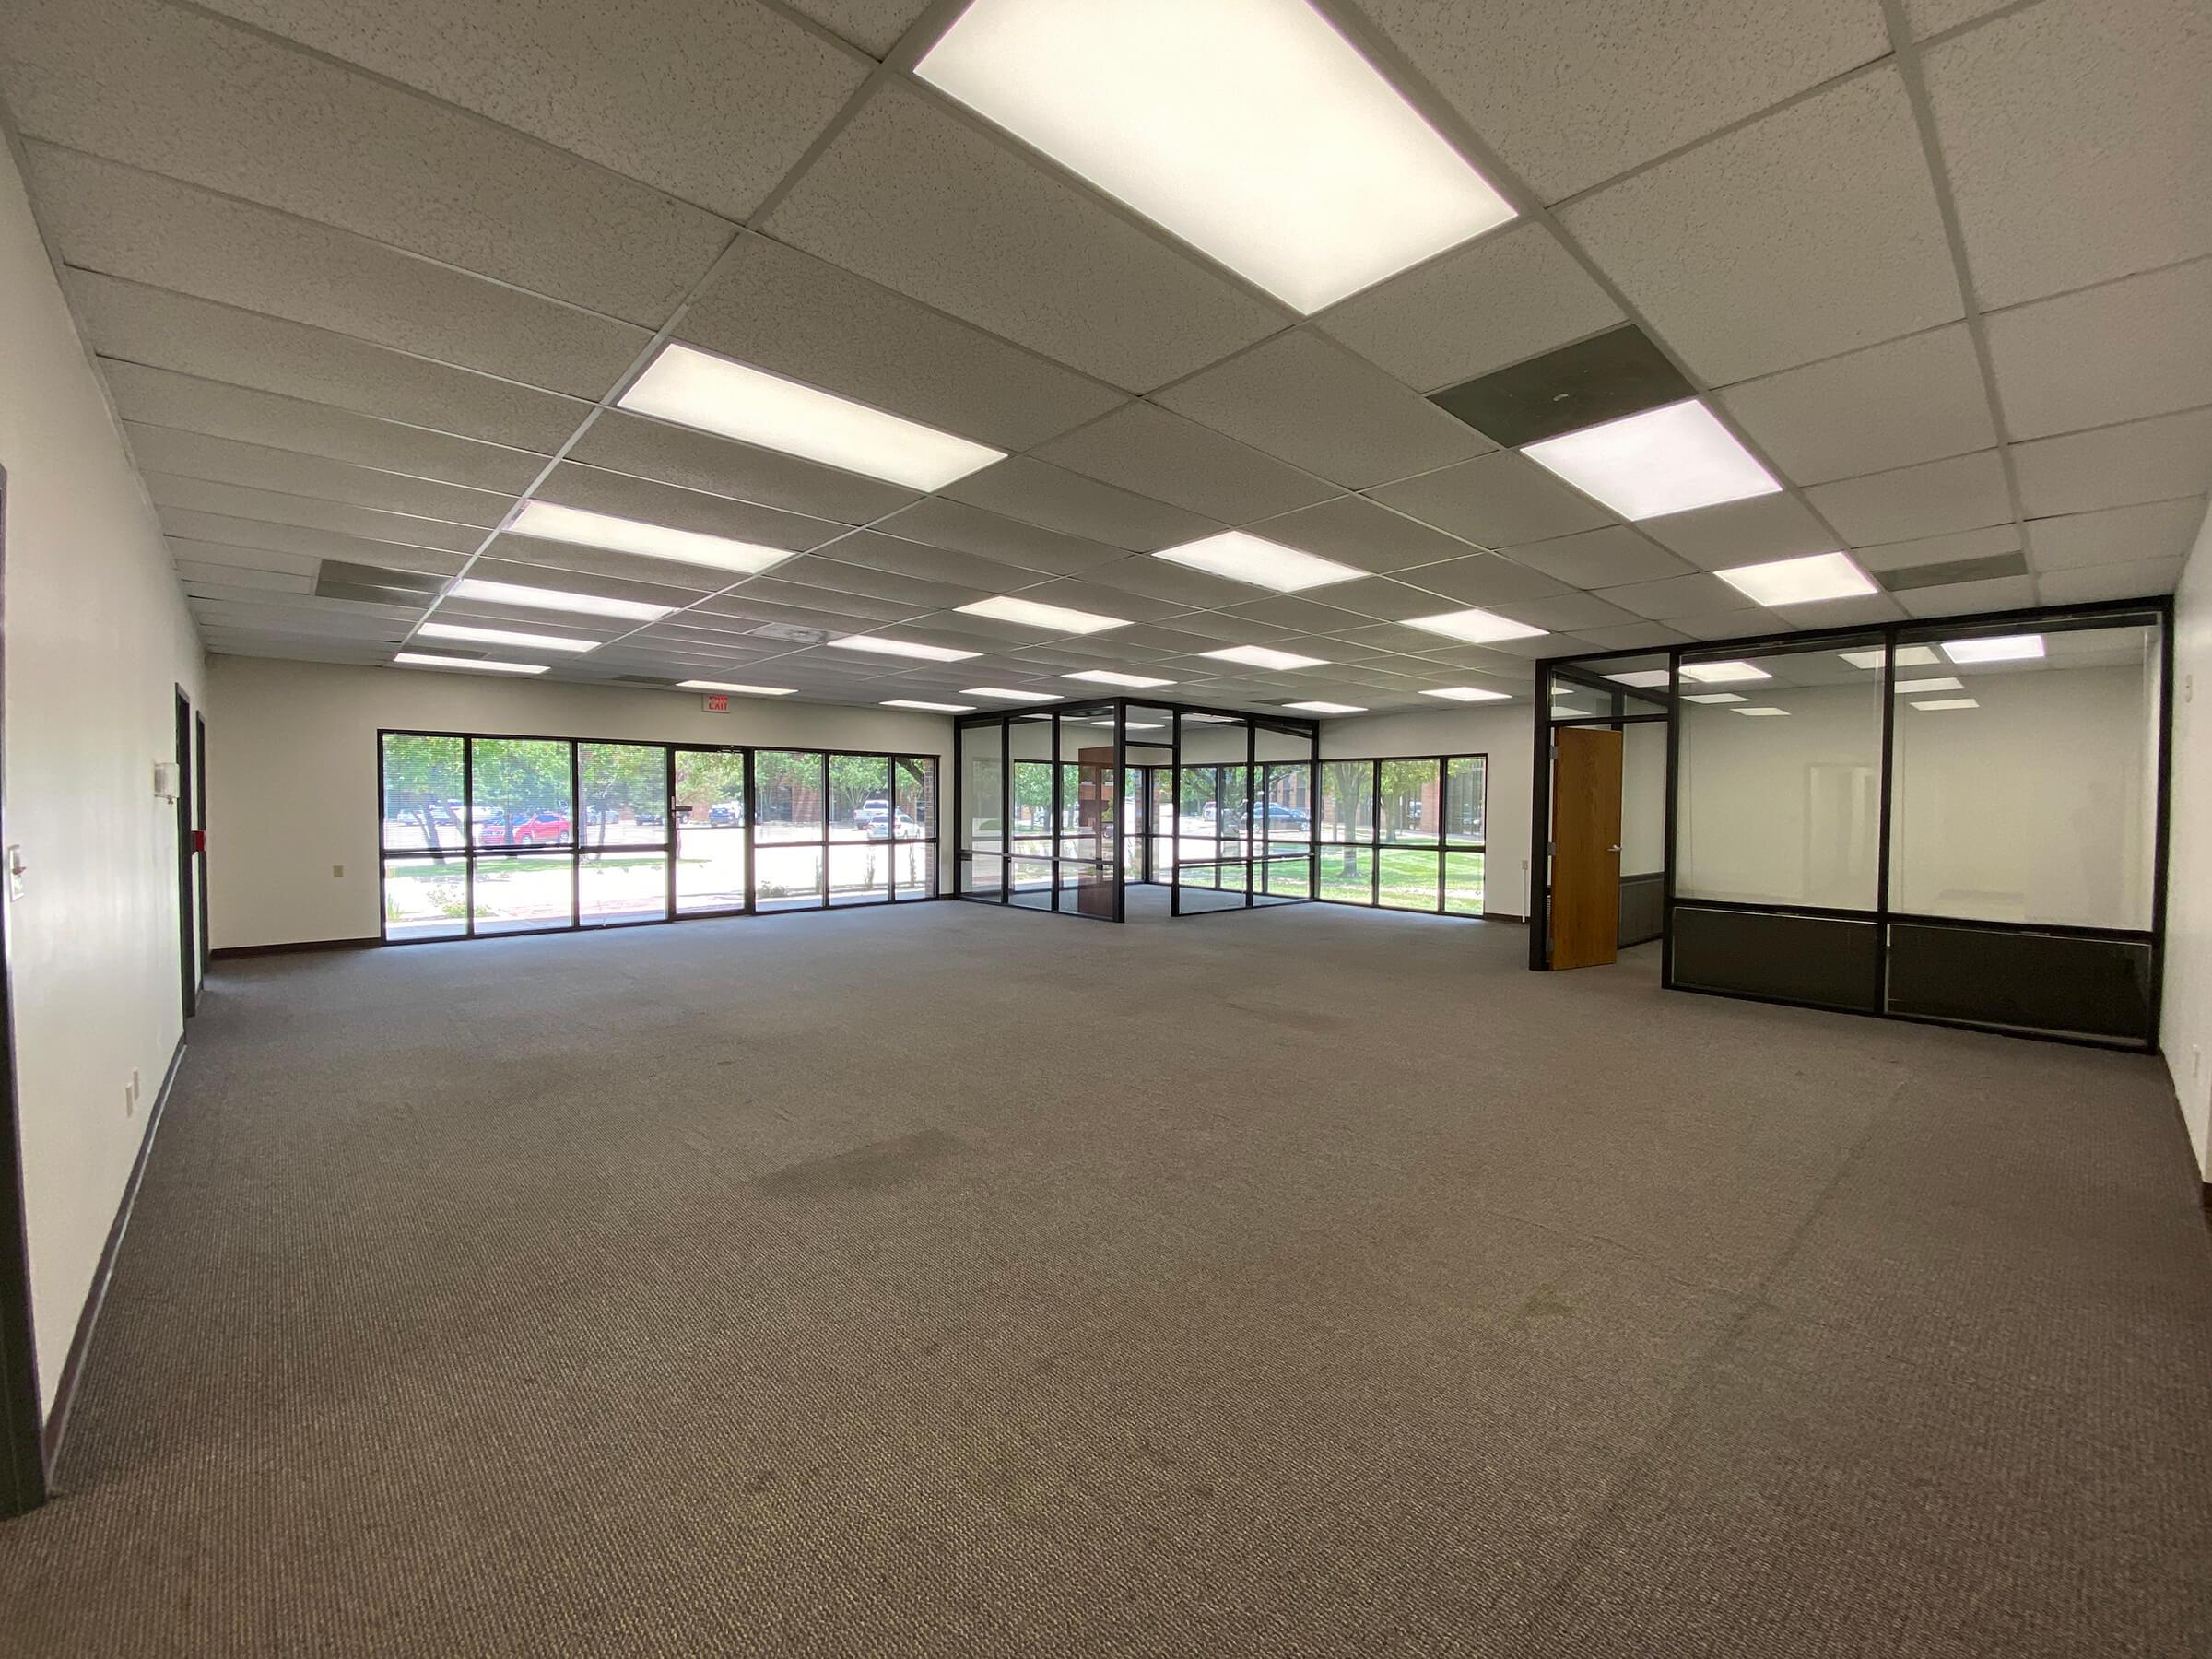 Northrock Business Park Syuite #300